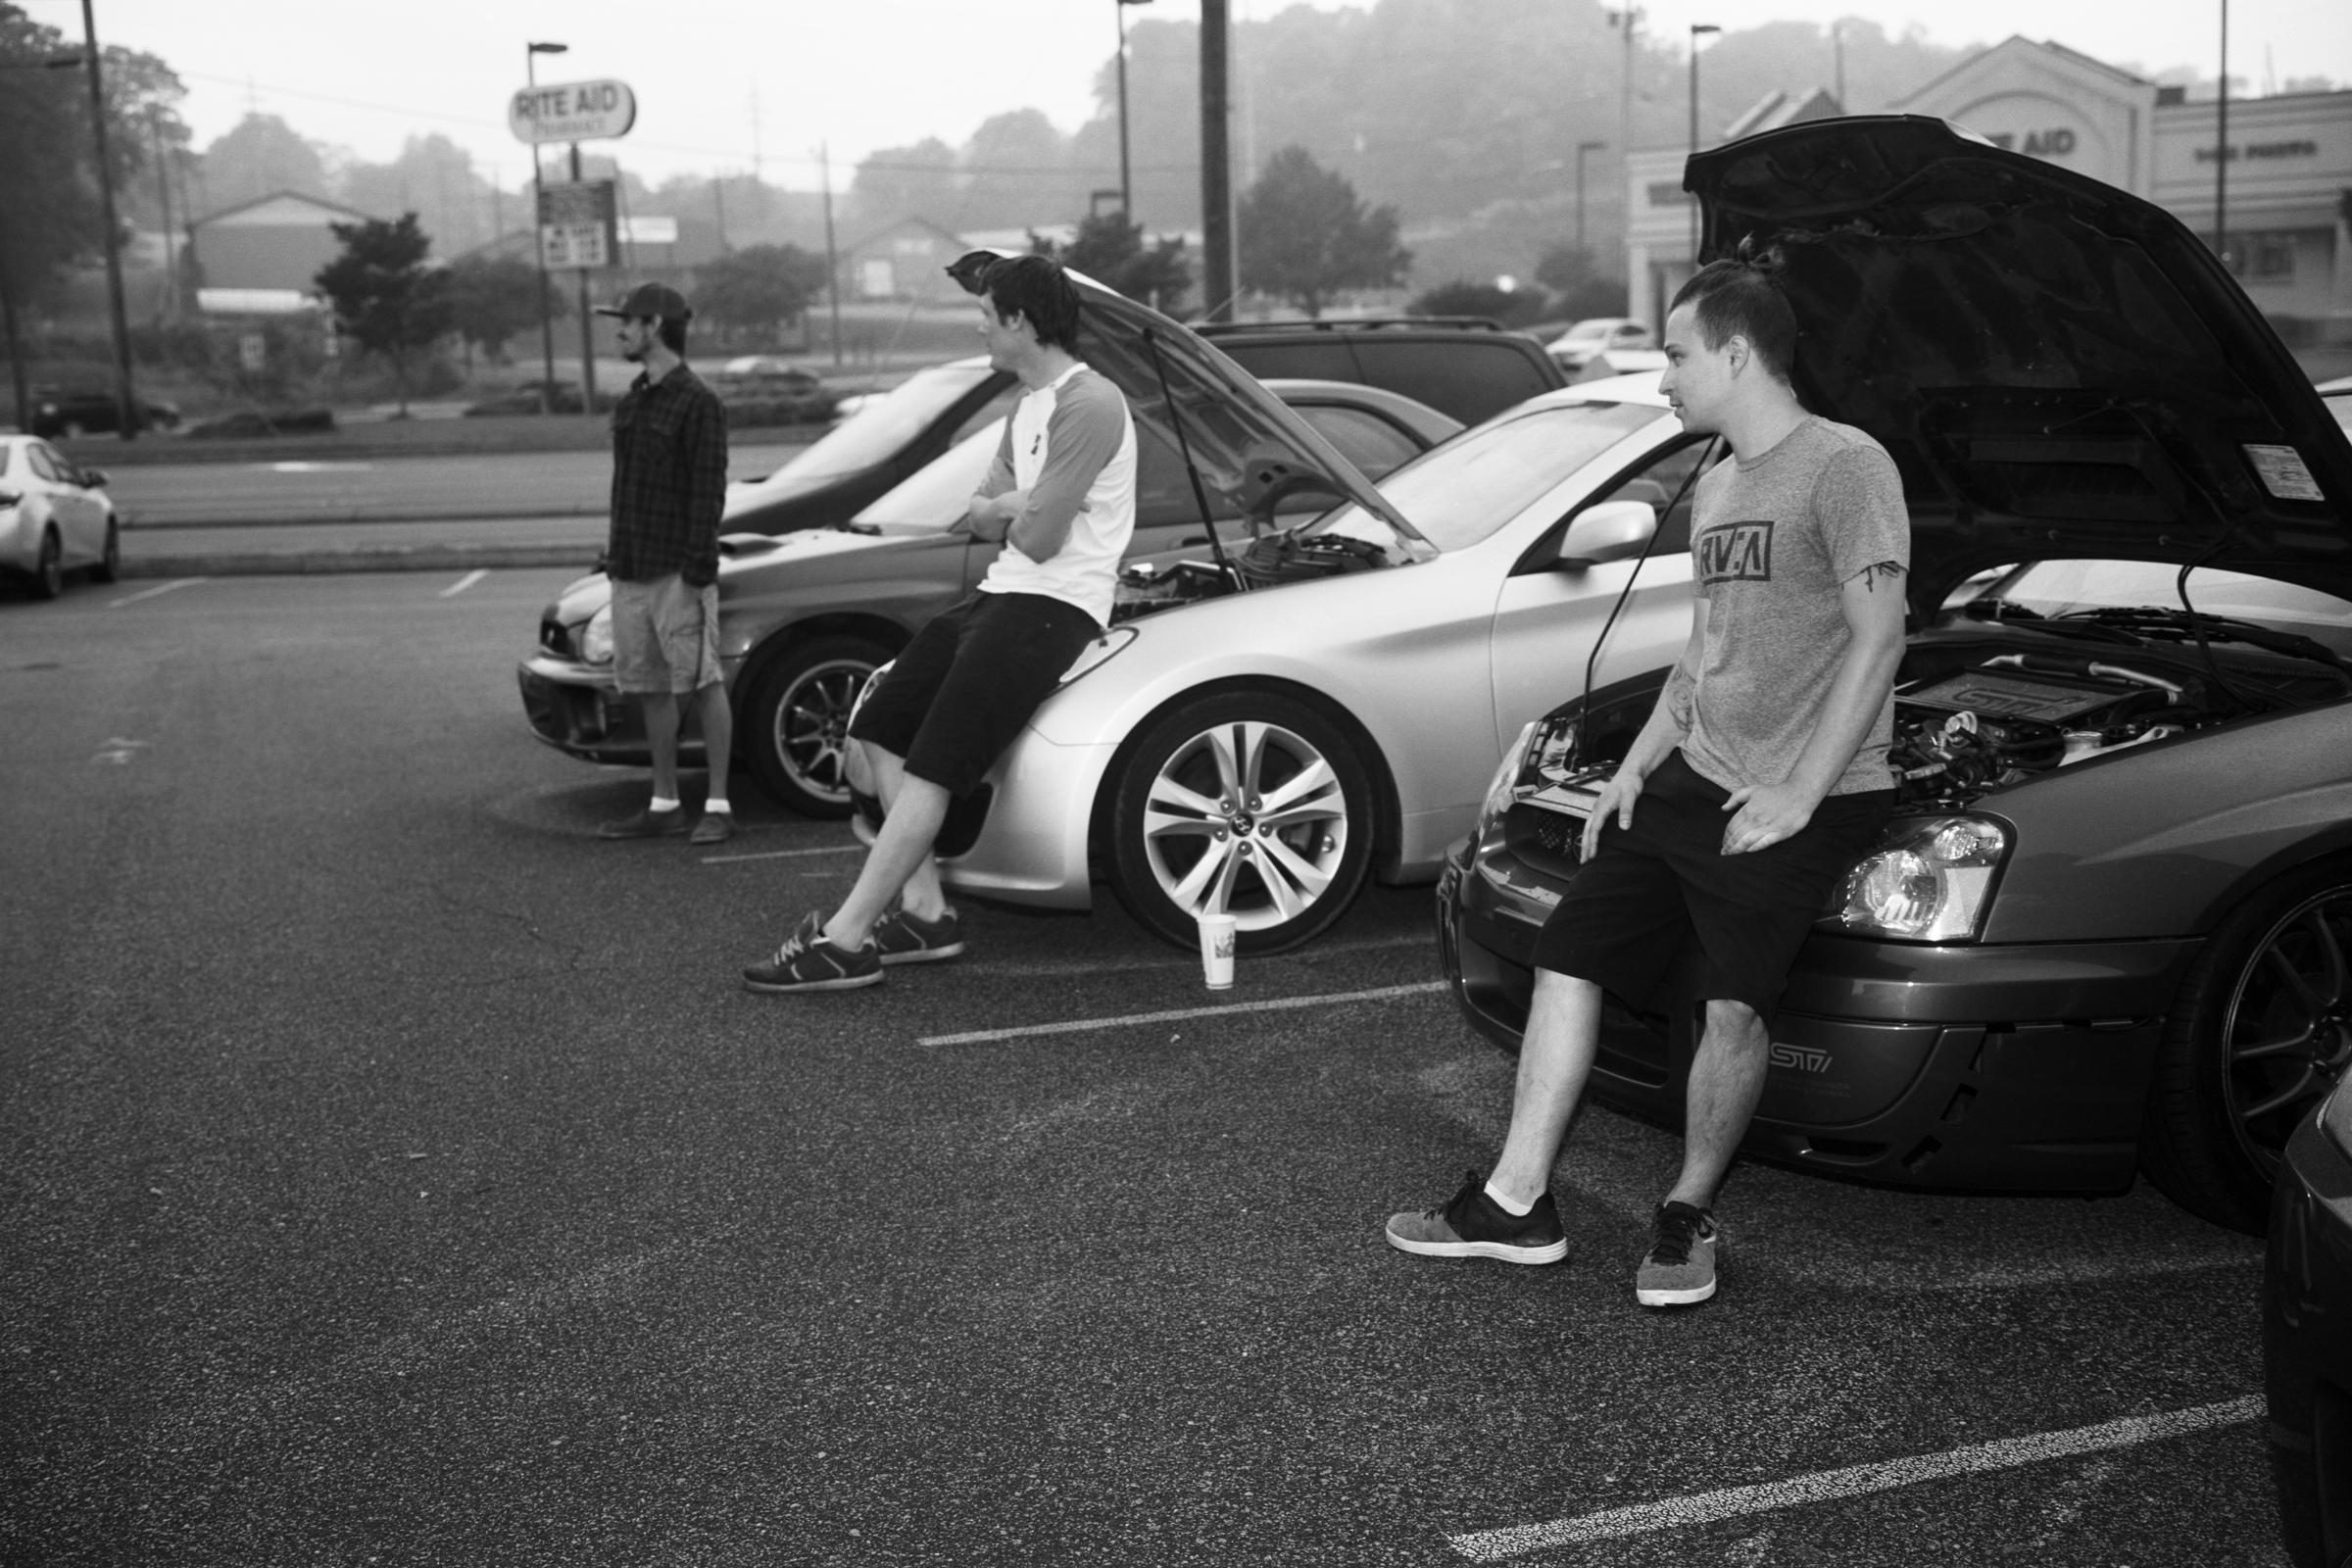 Hoods Up, 2016 / Morganton, NC